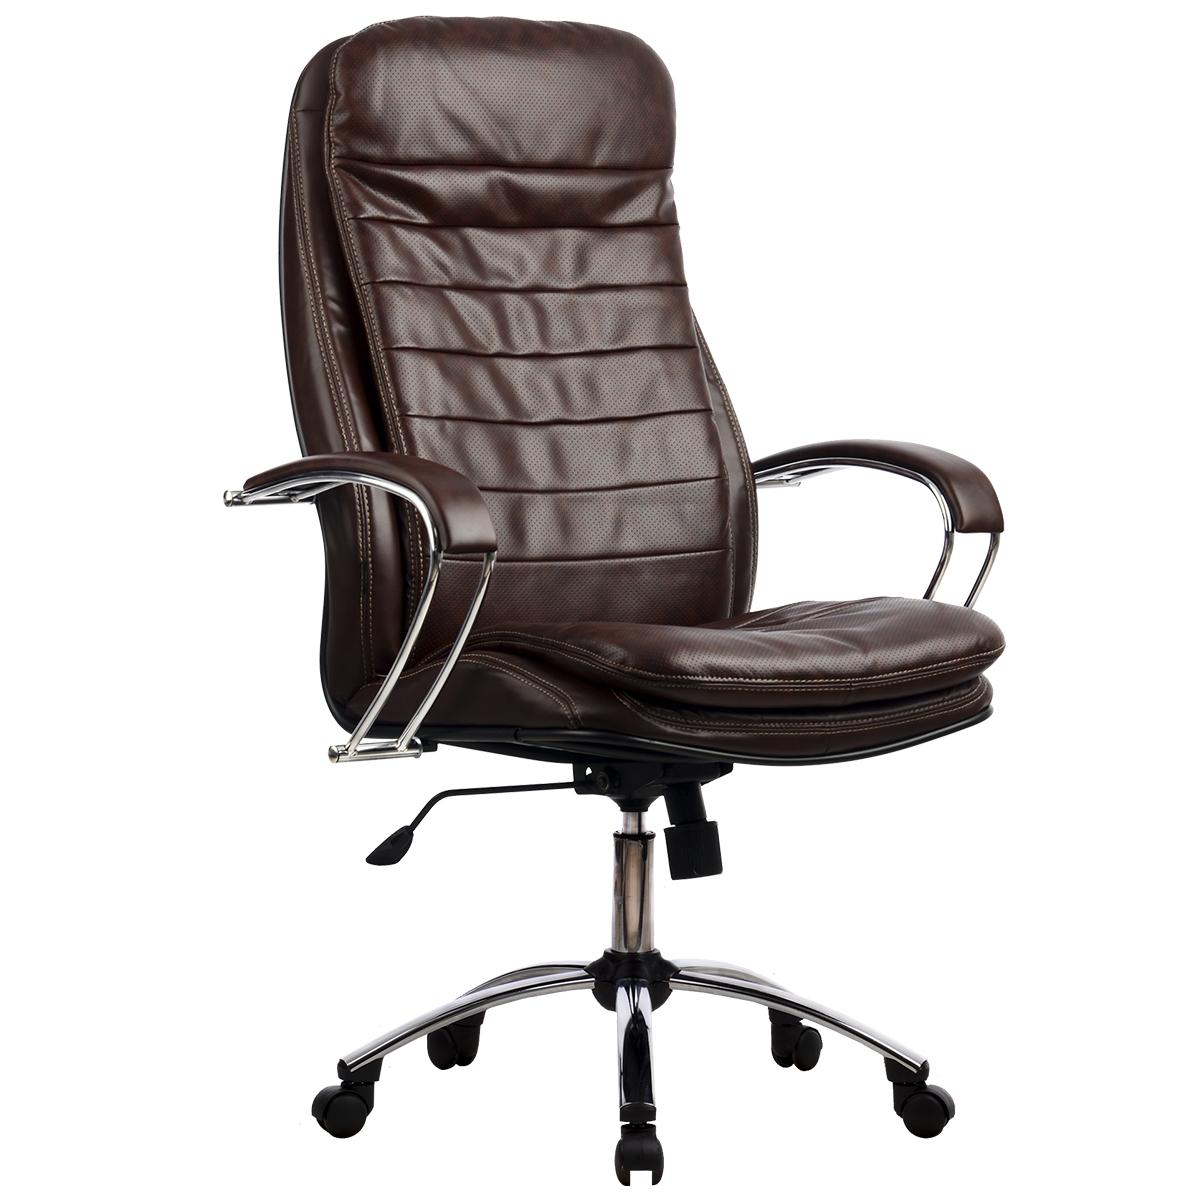 Кресло руководителя Metta LK-3 Кожа NewLeather кожа коричневый